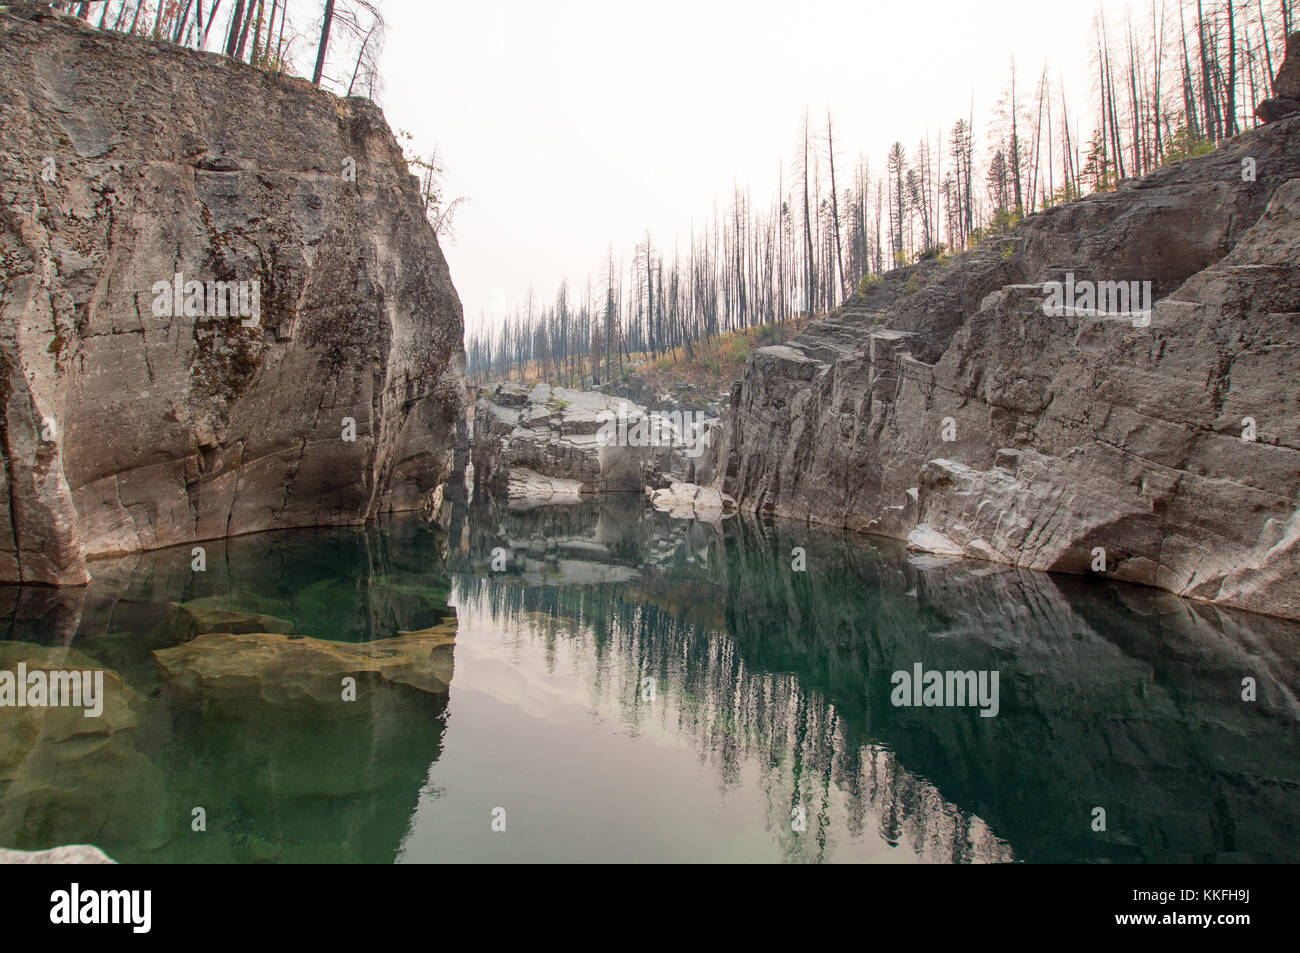 a still forest pool pdf